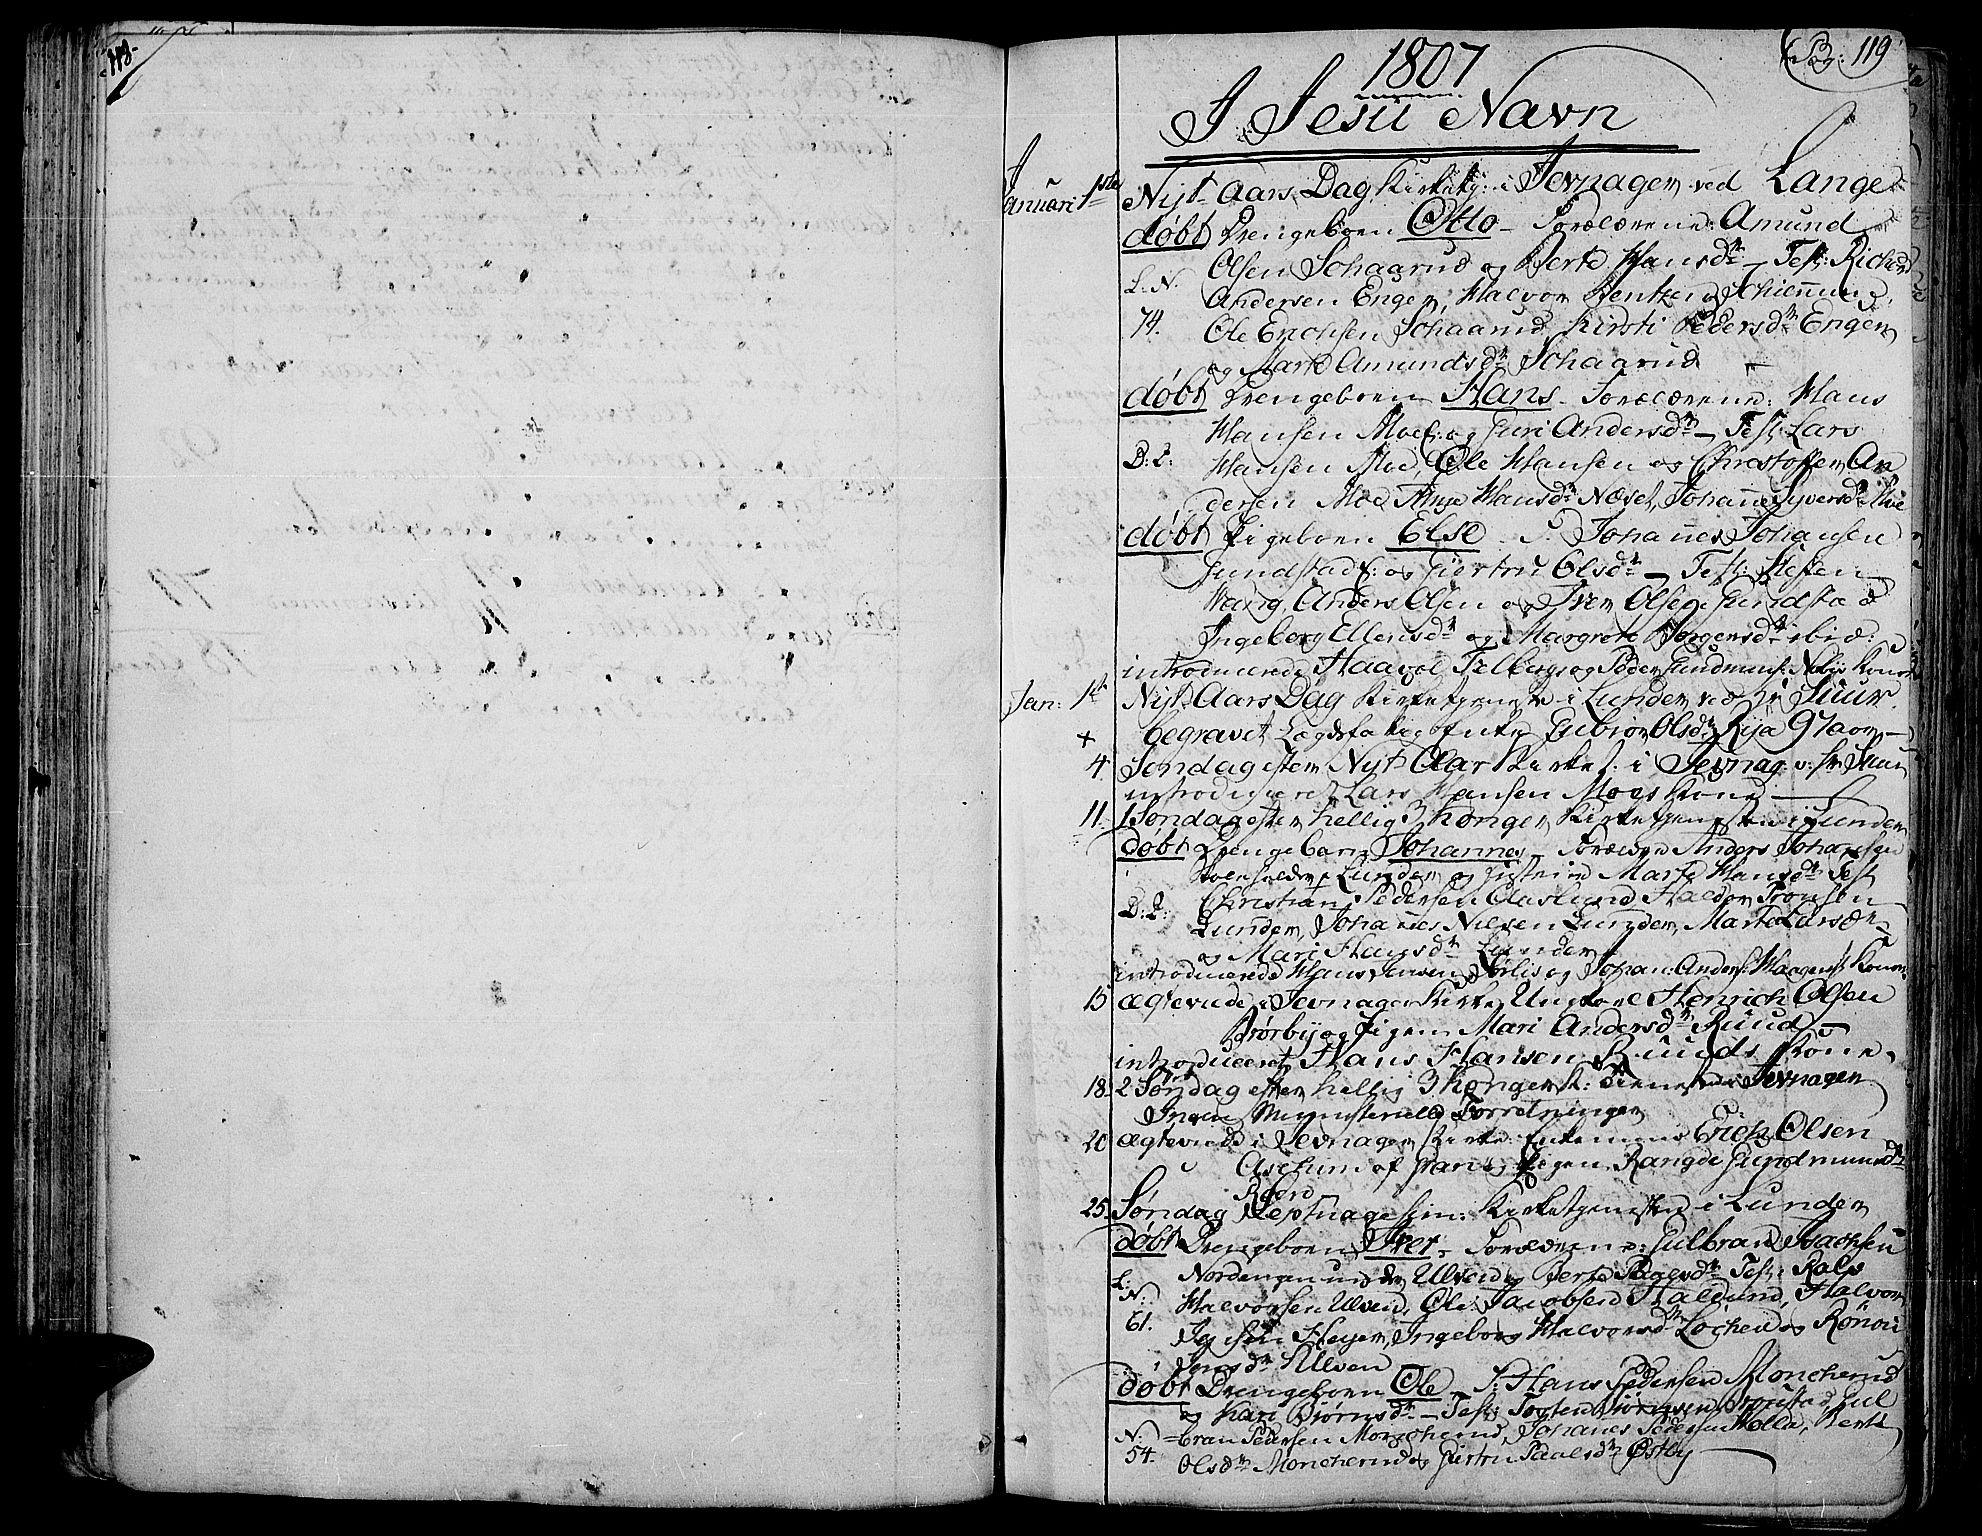 SAH, Jevnaker prestekontor, Ministerialbok nr. 4, 1800-1861, s. 118-119